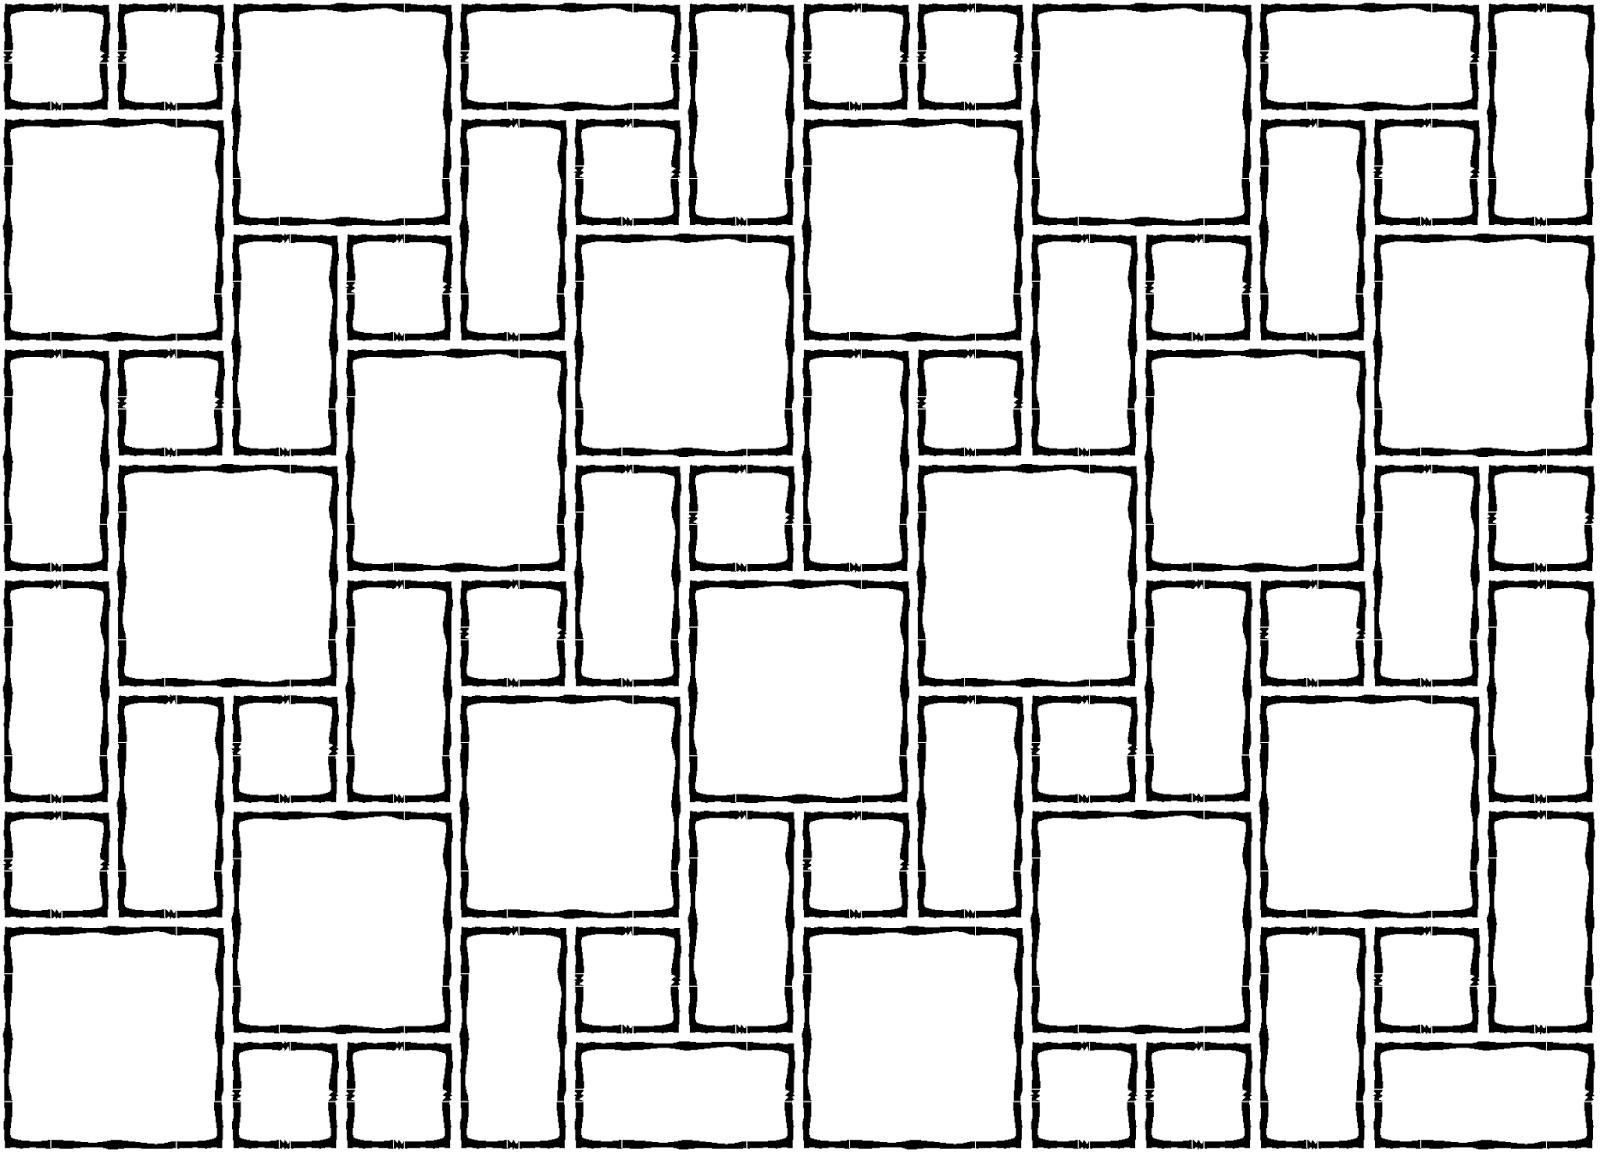 Tudor Patio Slab Laying Pattern